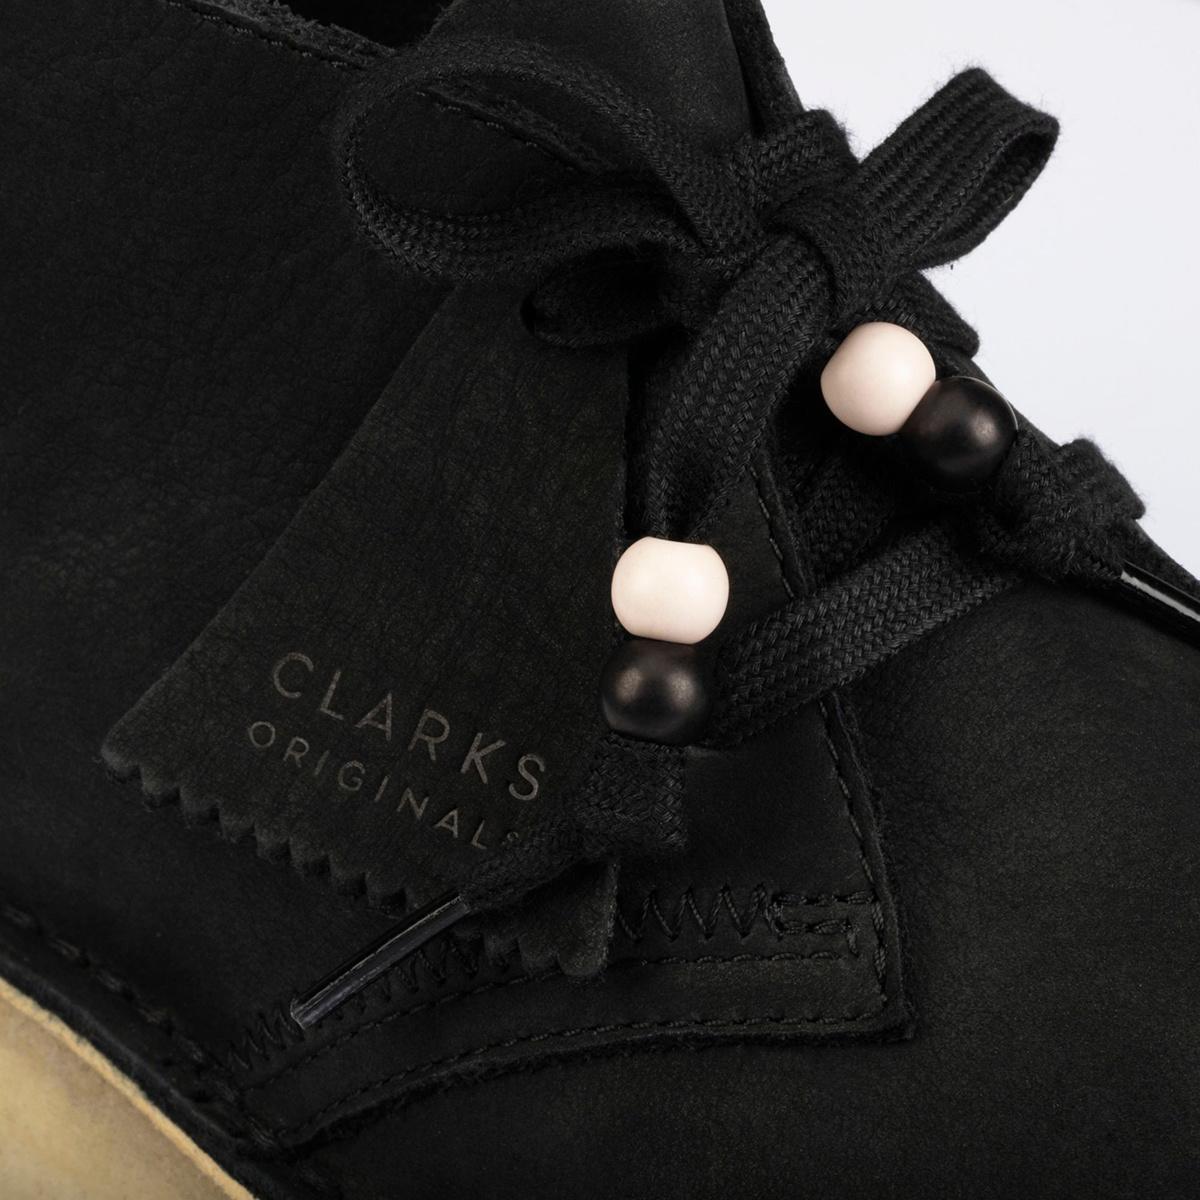 Clarks Desert Coal L (Black Nubuck) 26163249